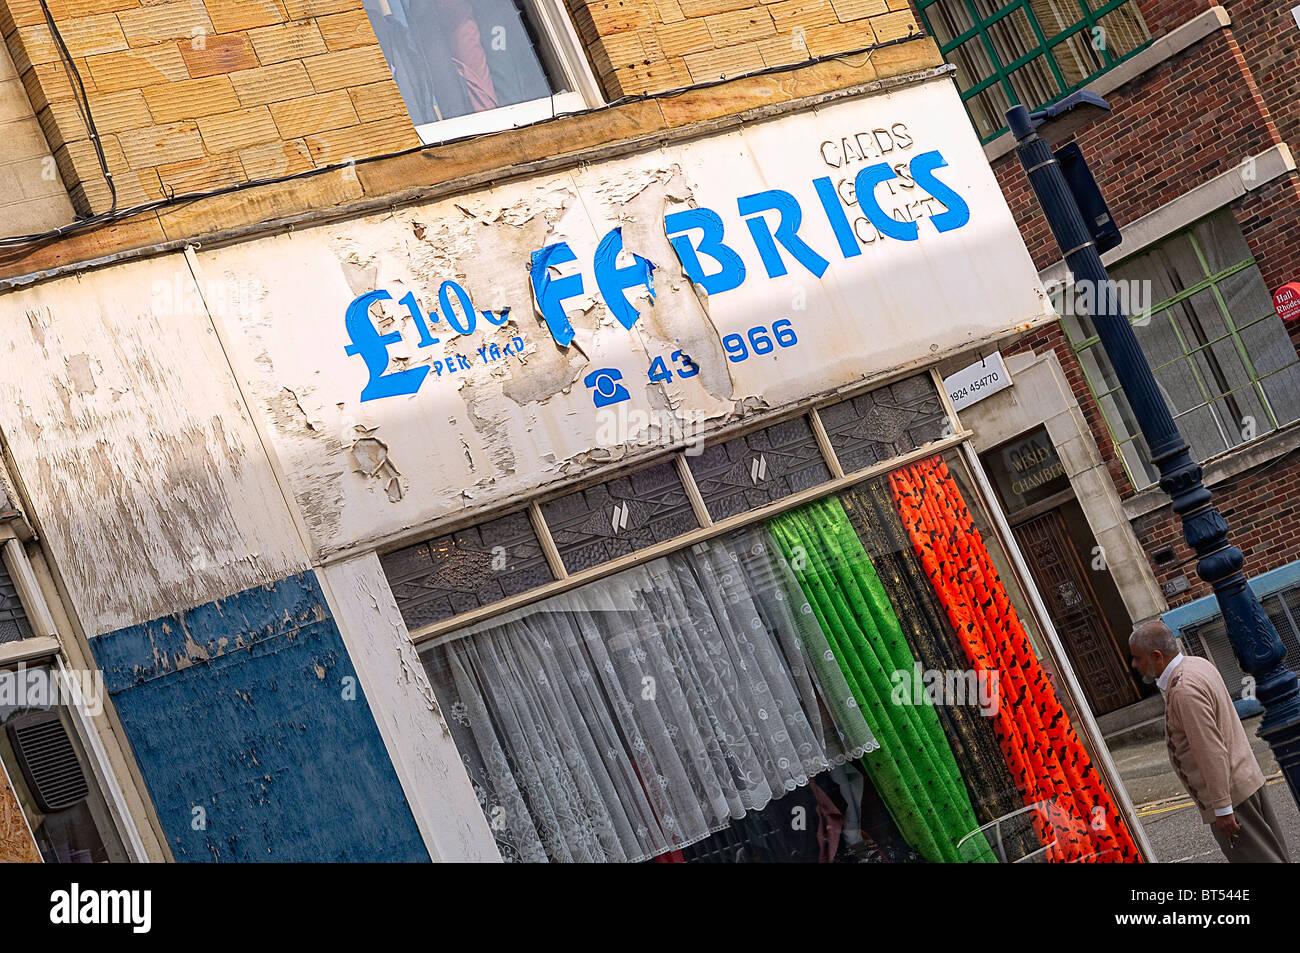 Run down fabric shop, Dewsbury, West Yorkshire UK - Stock Image